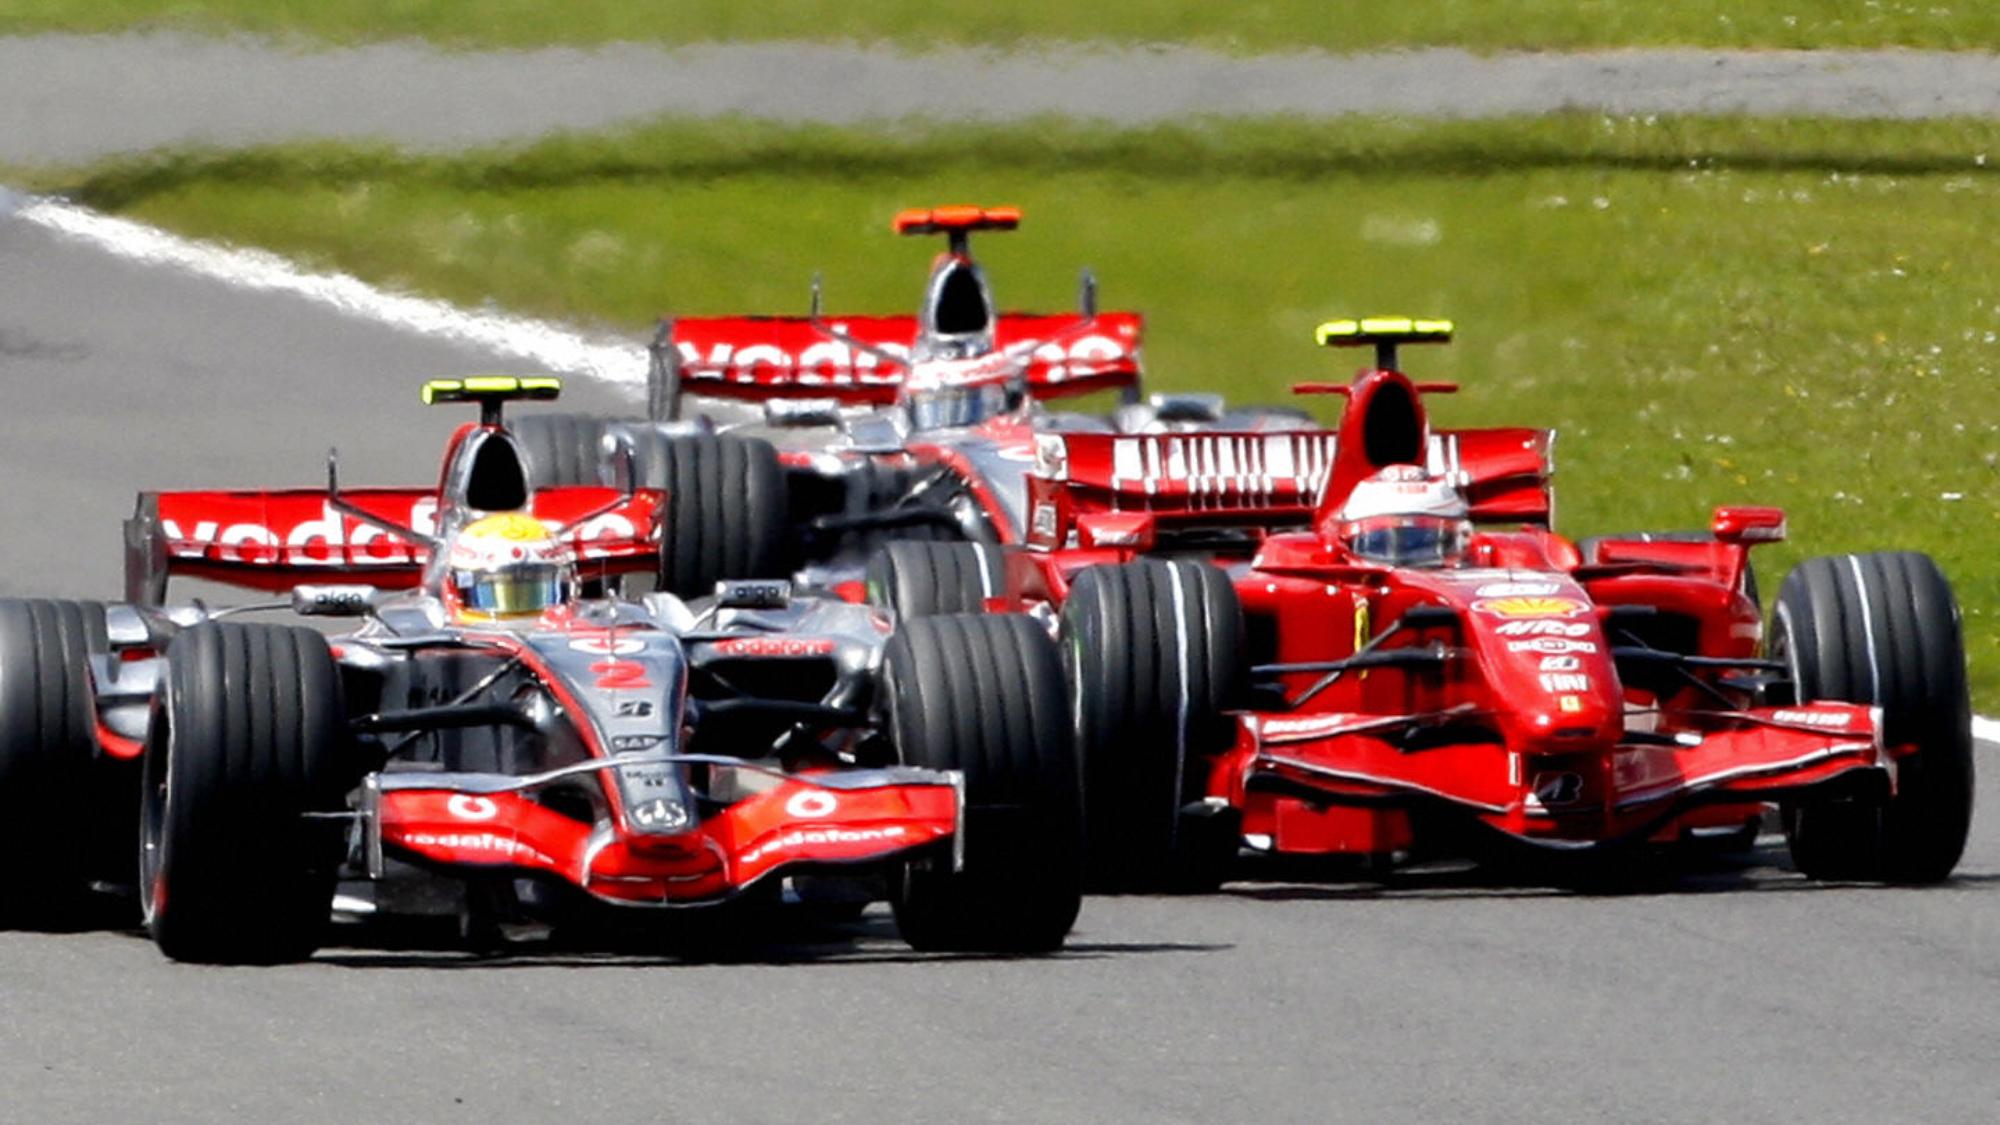 2007 British GP, Kimi Raikkonen